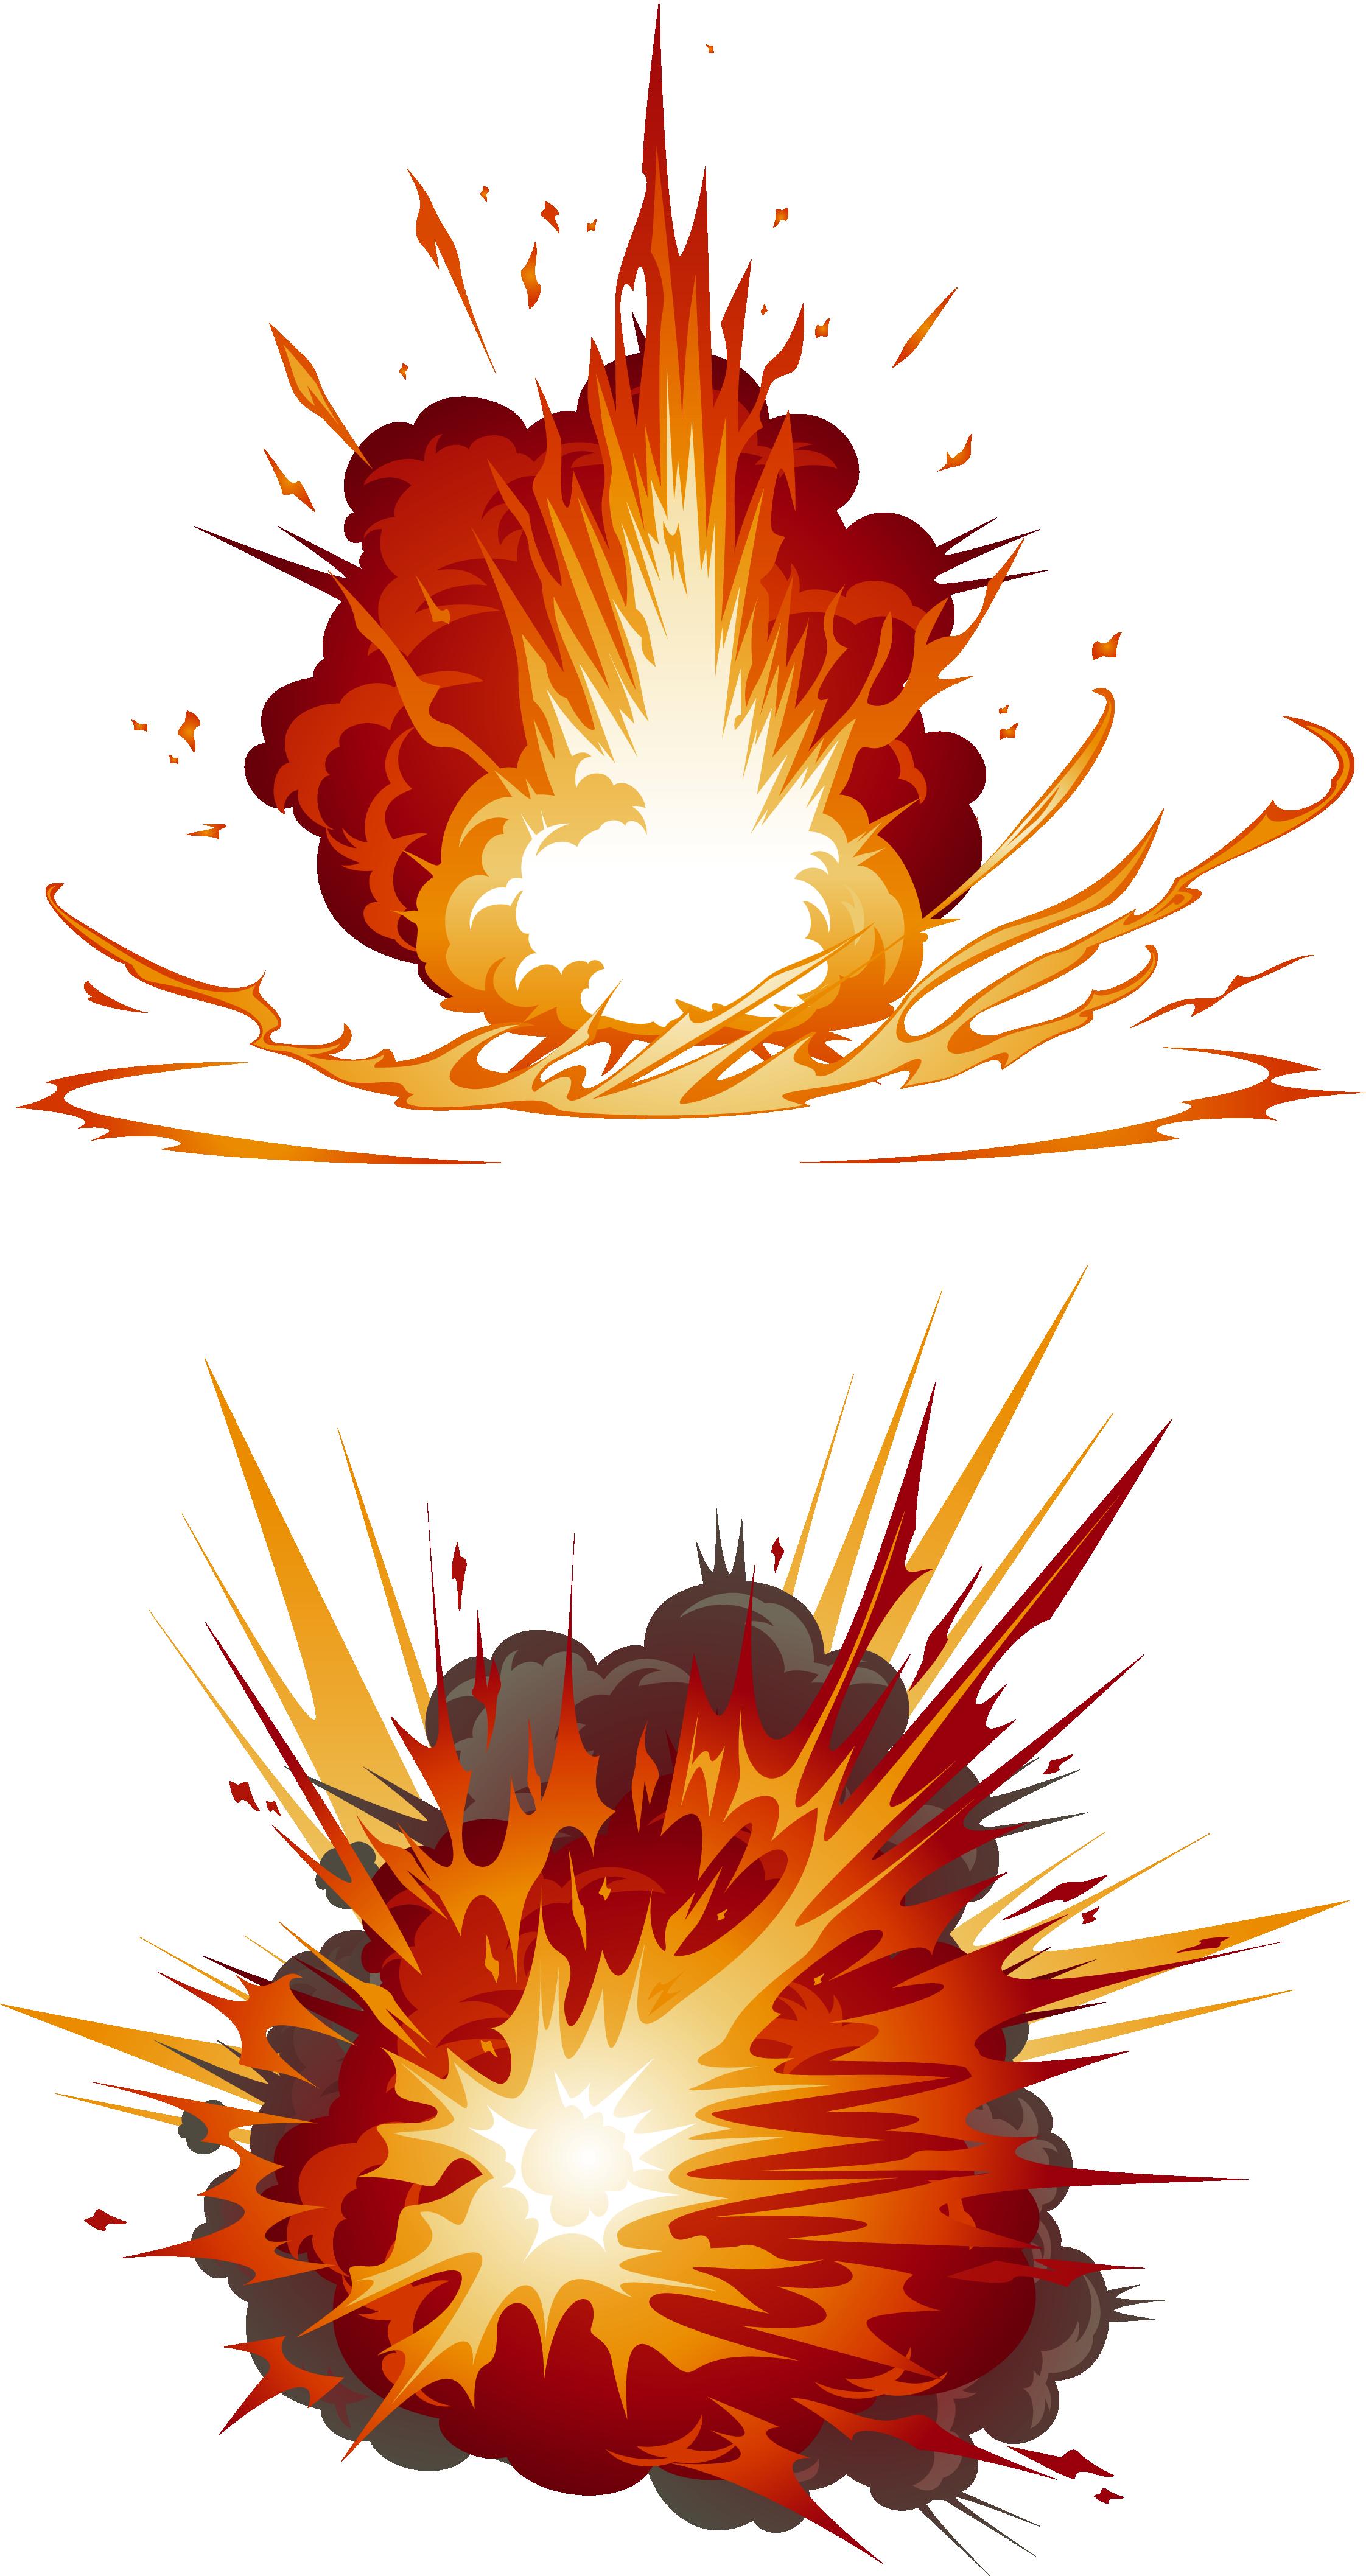 Firecracker clipart explosion. Blast my explosions